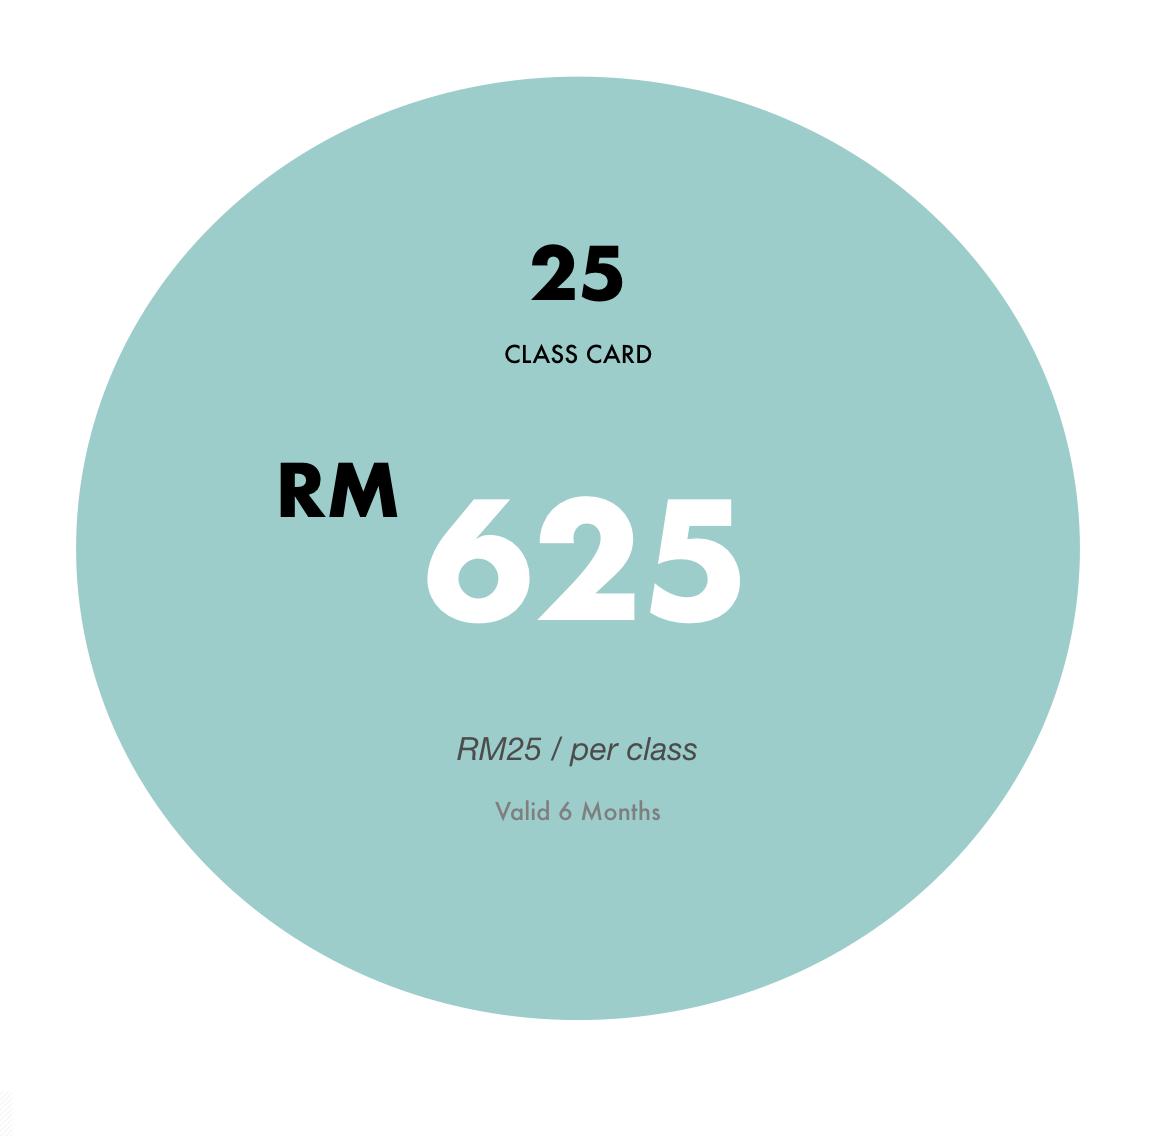 MYR22 Per Class